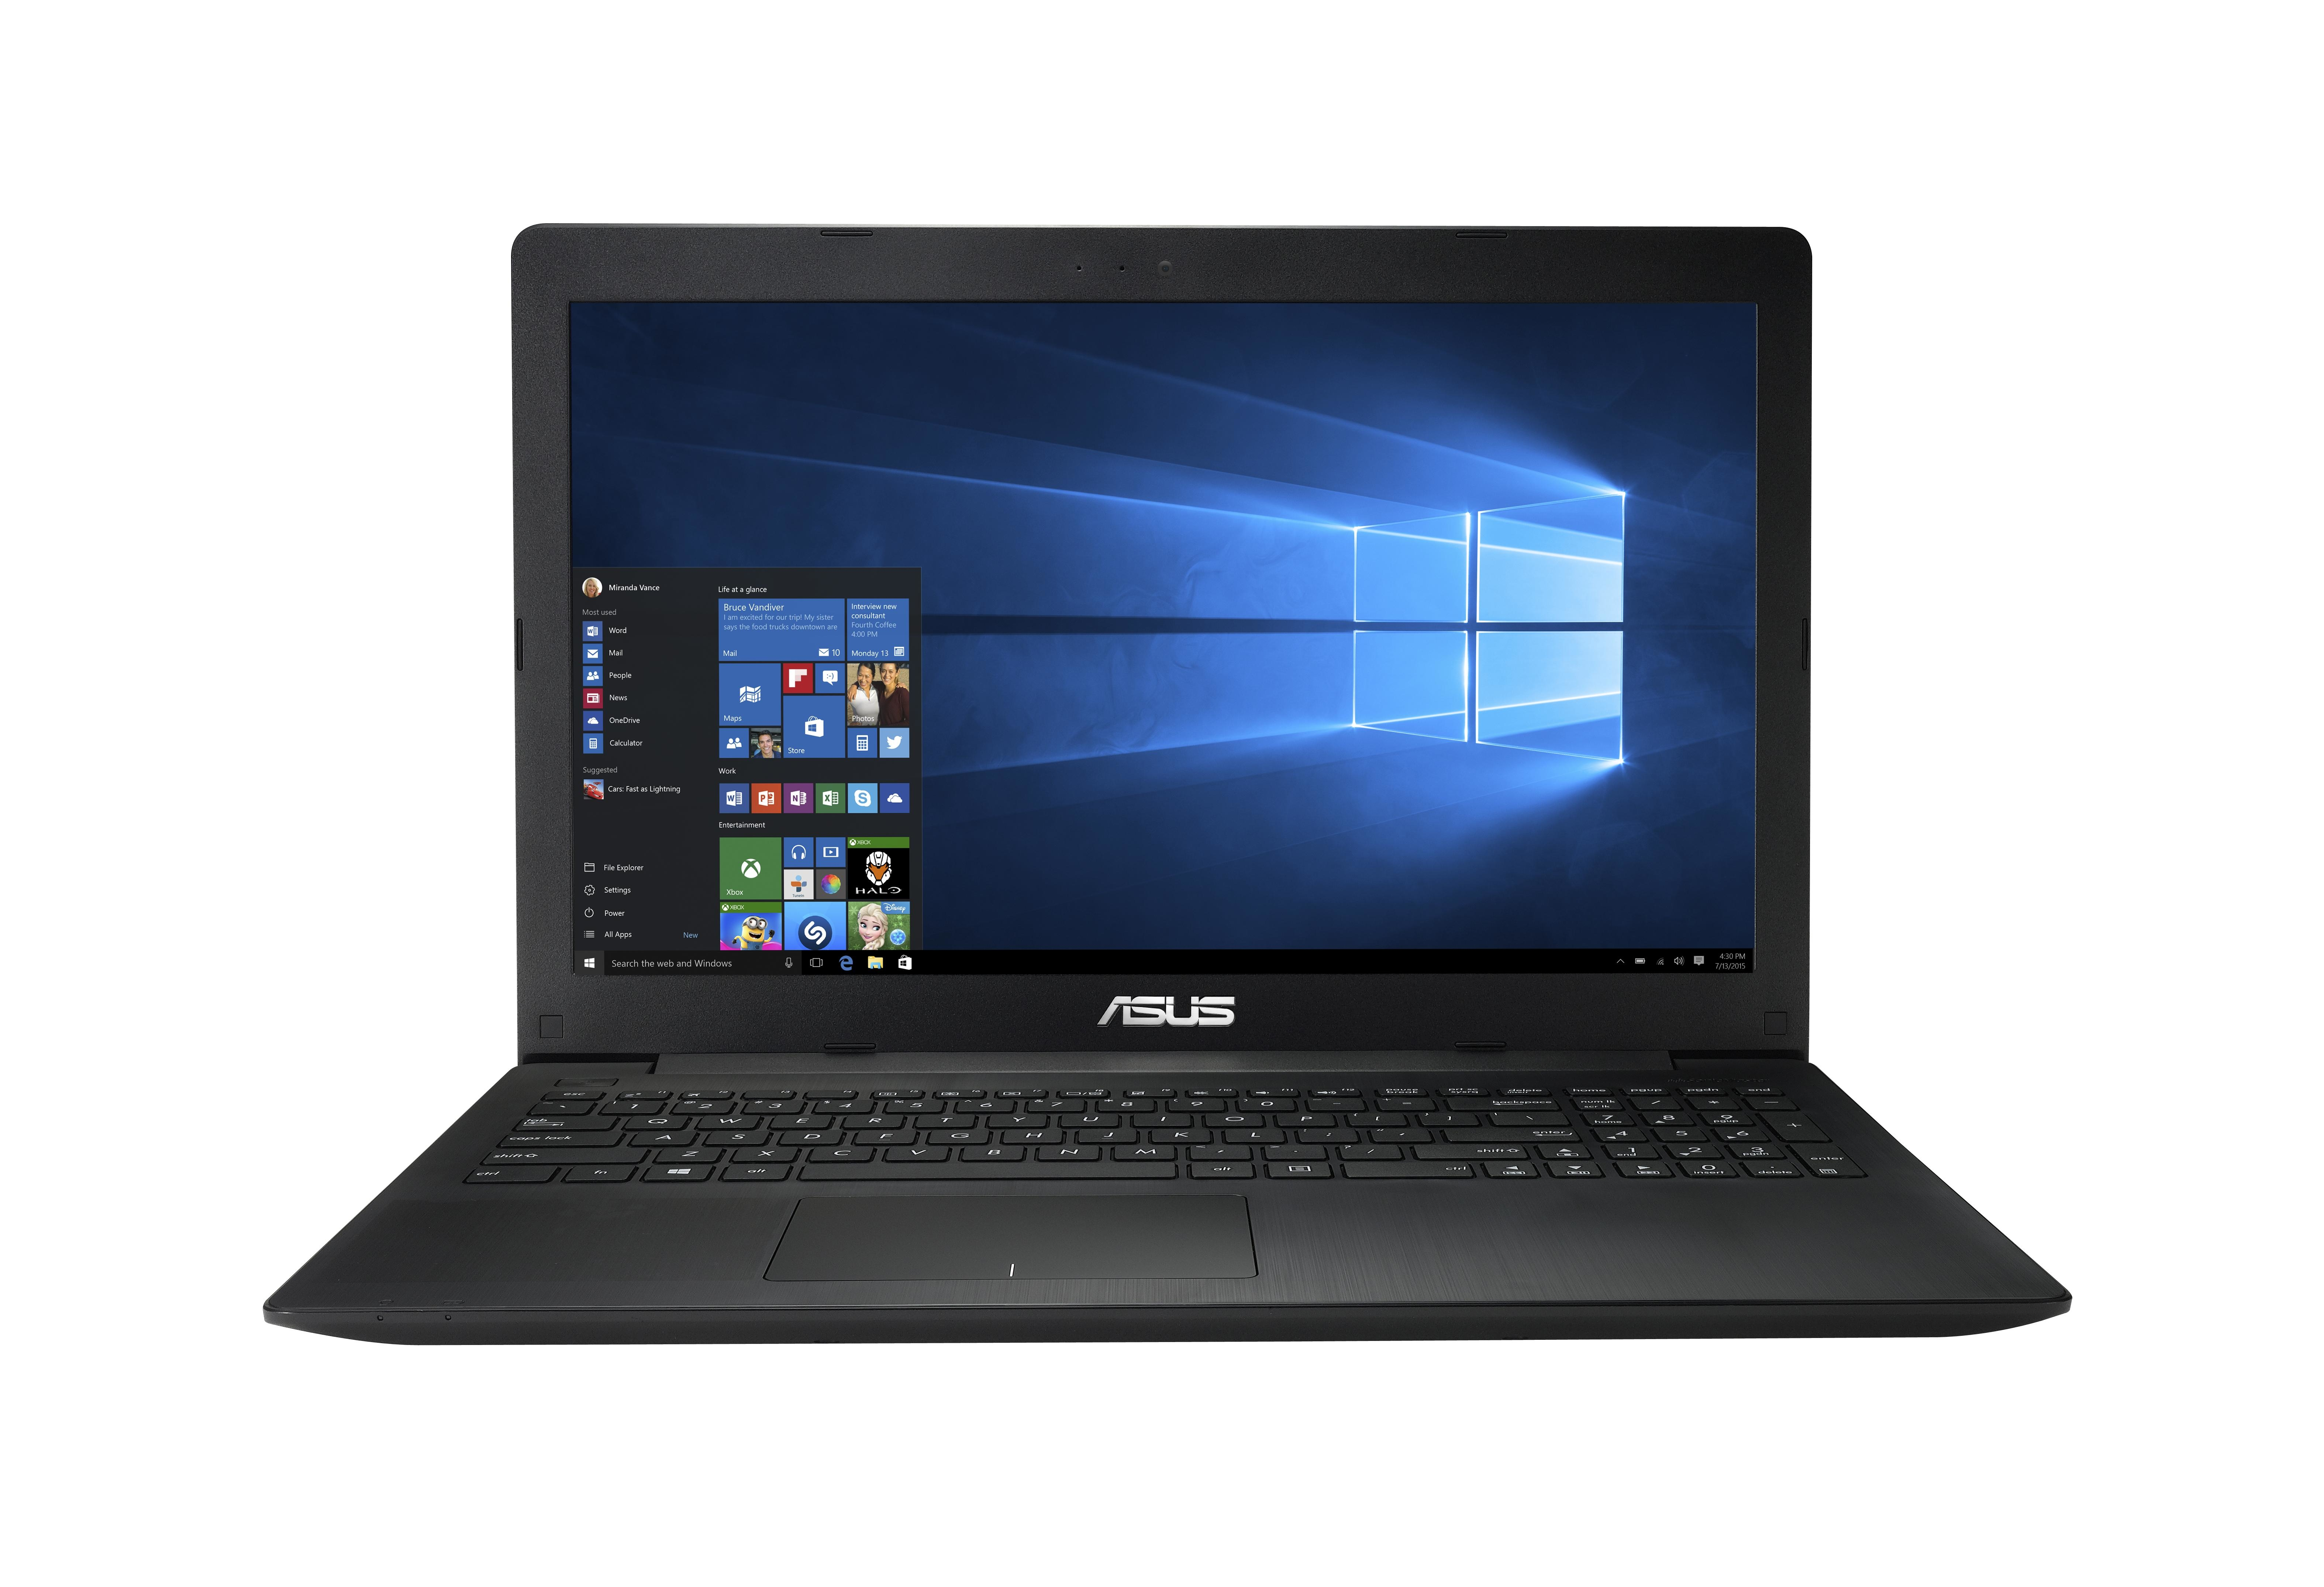 "ASUS X553SA-XX166T Intel Celeron N3050 1.60 GHz 1TB Hard Drive 4GB RAM 15.6"" Widescreen Windows 10 Home"